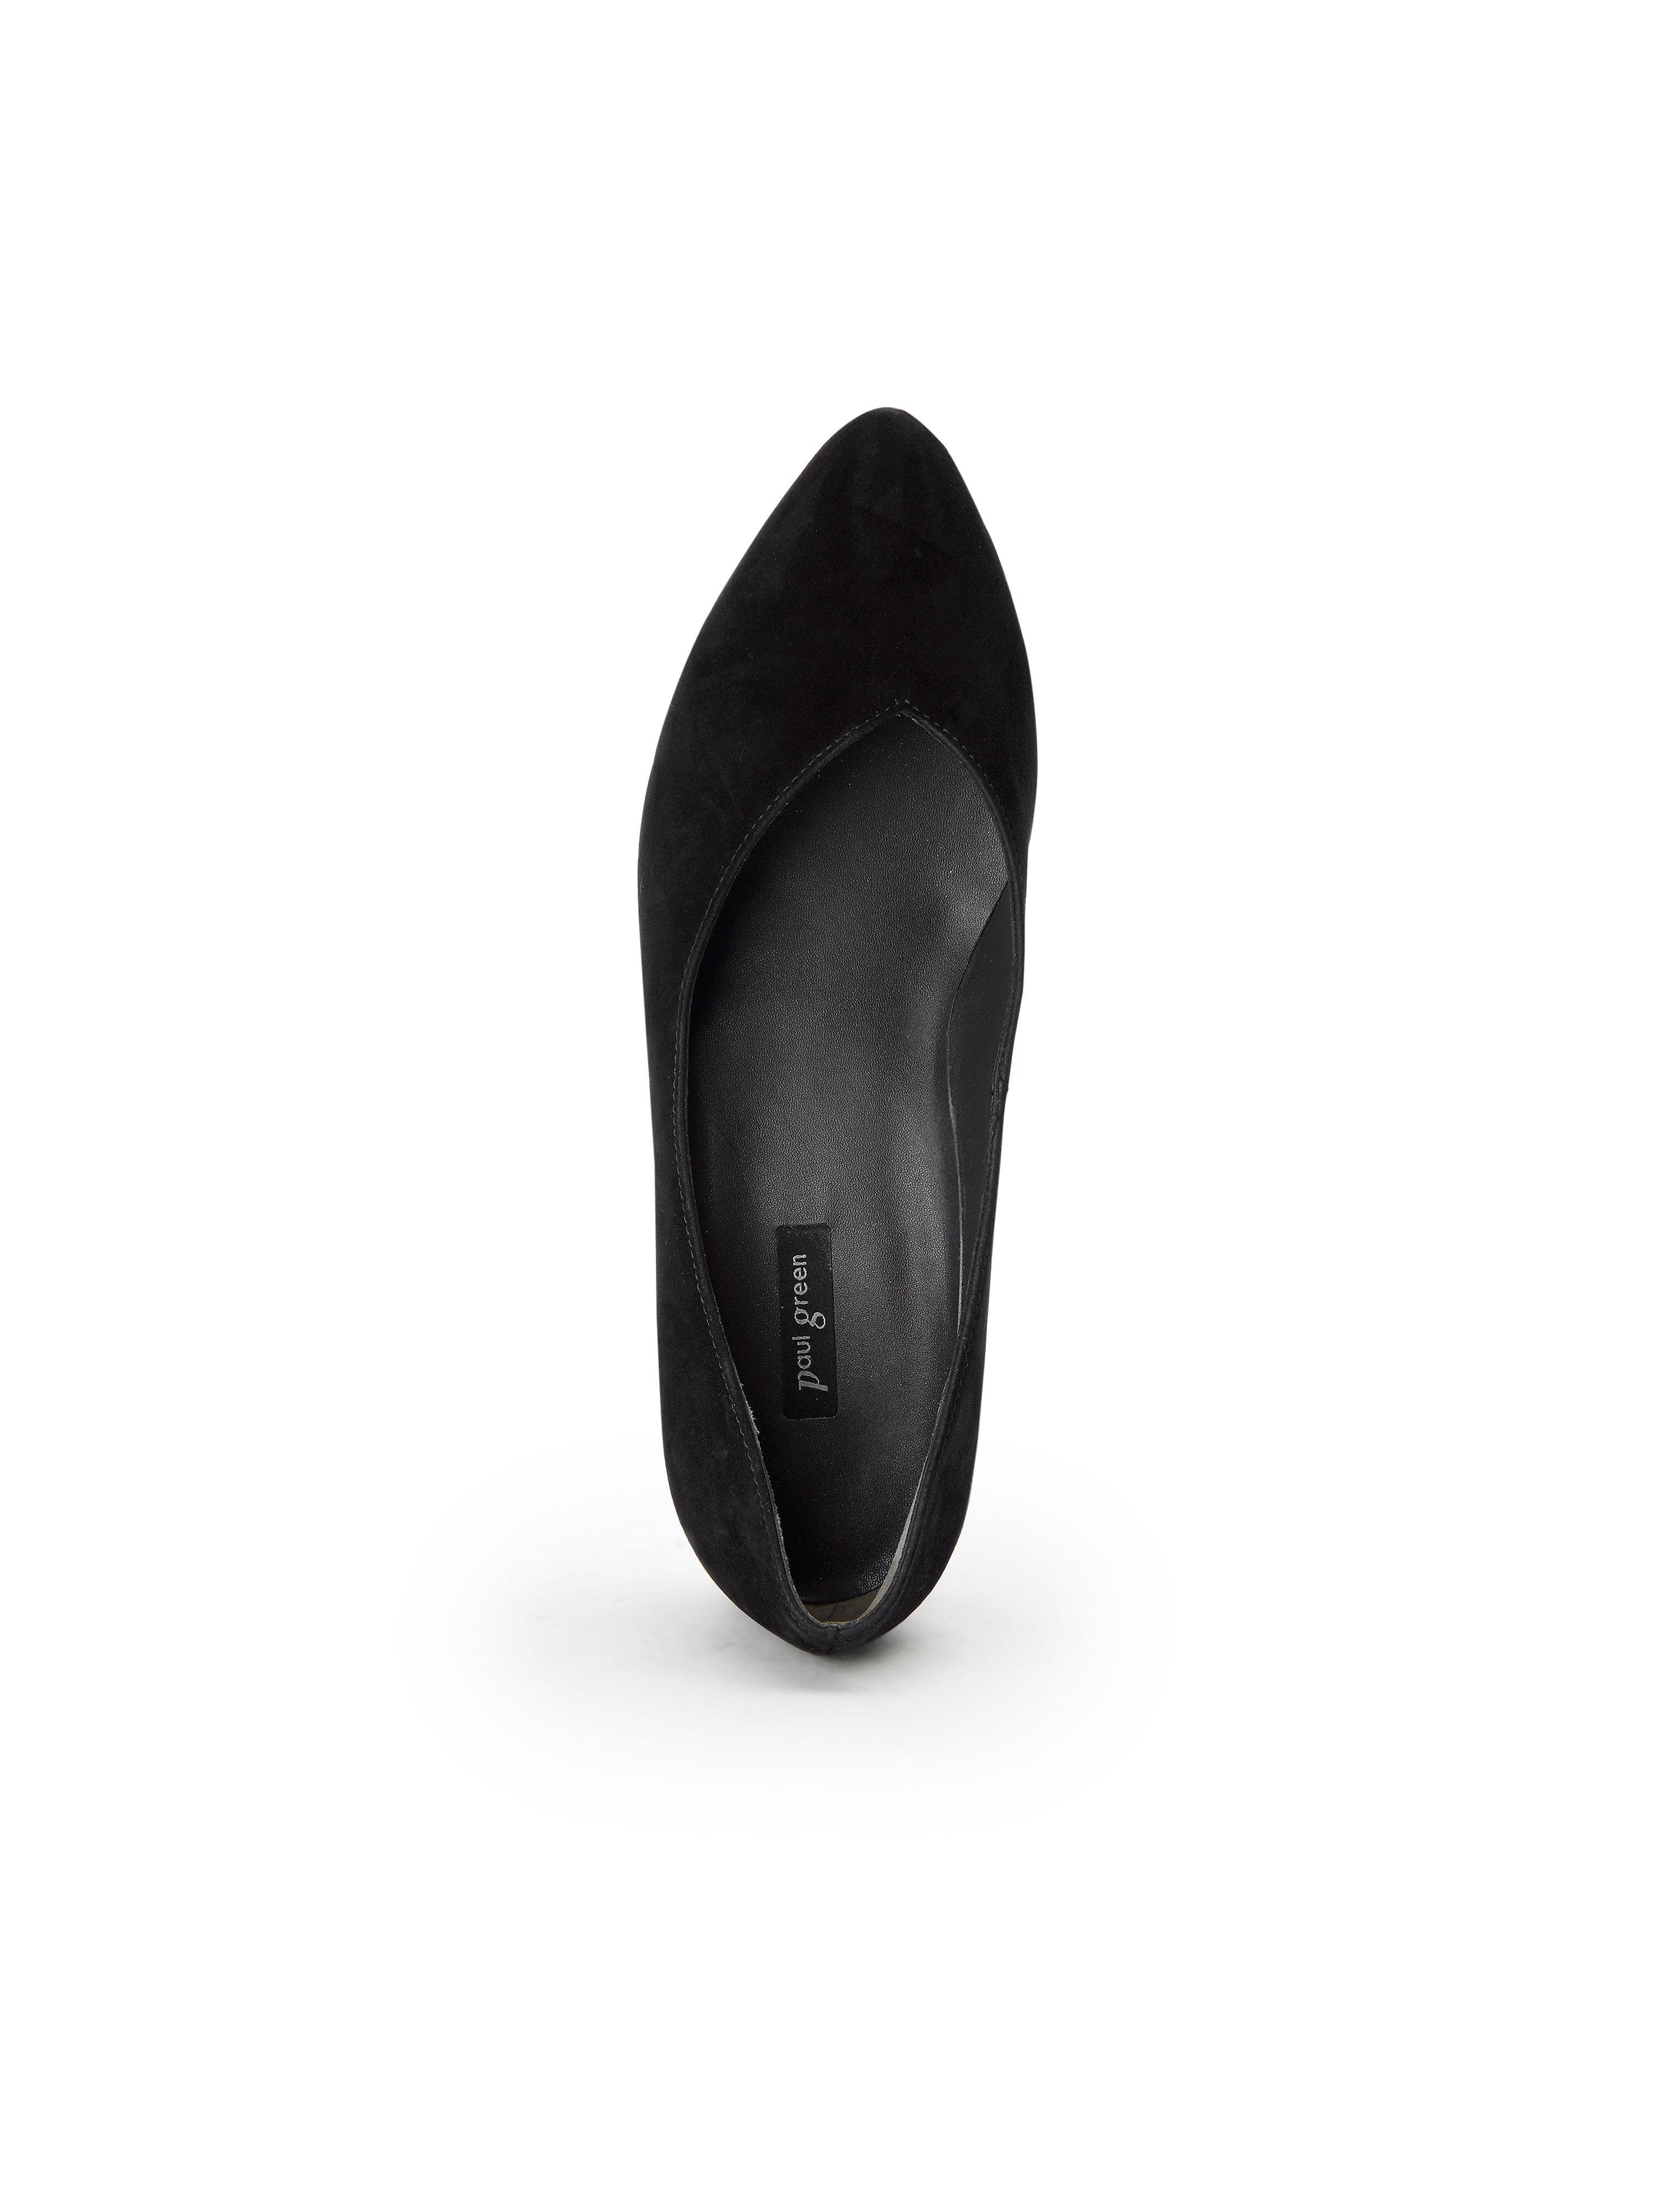 Paul Grün - Ballerina aus 100% Leder Leder Leder - Schwarz Gute Qualität beliebte Schuhe 1db32c